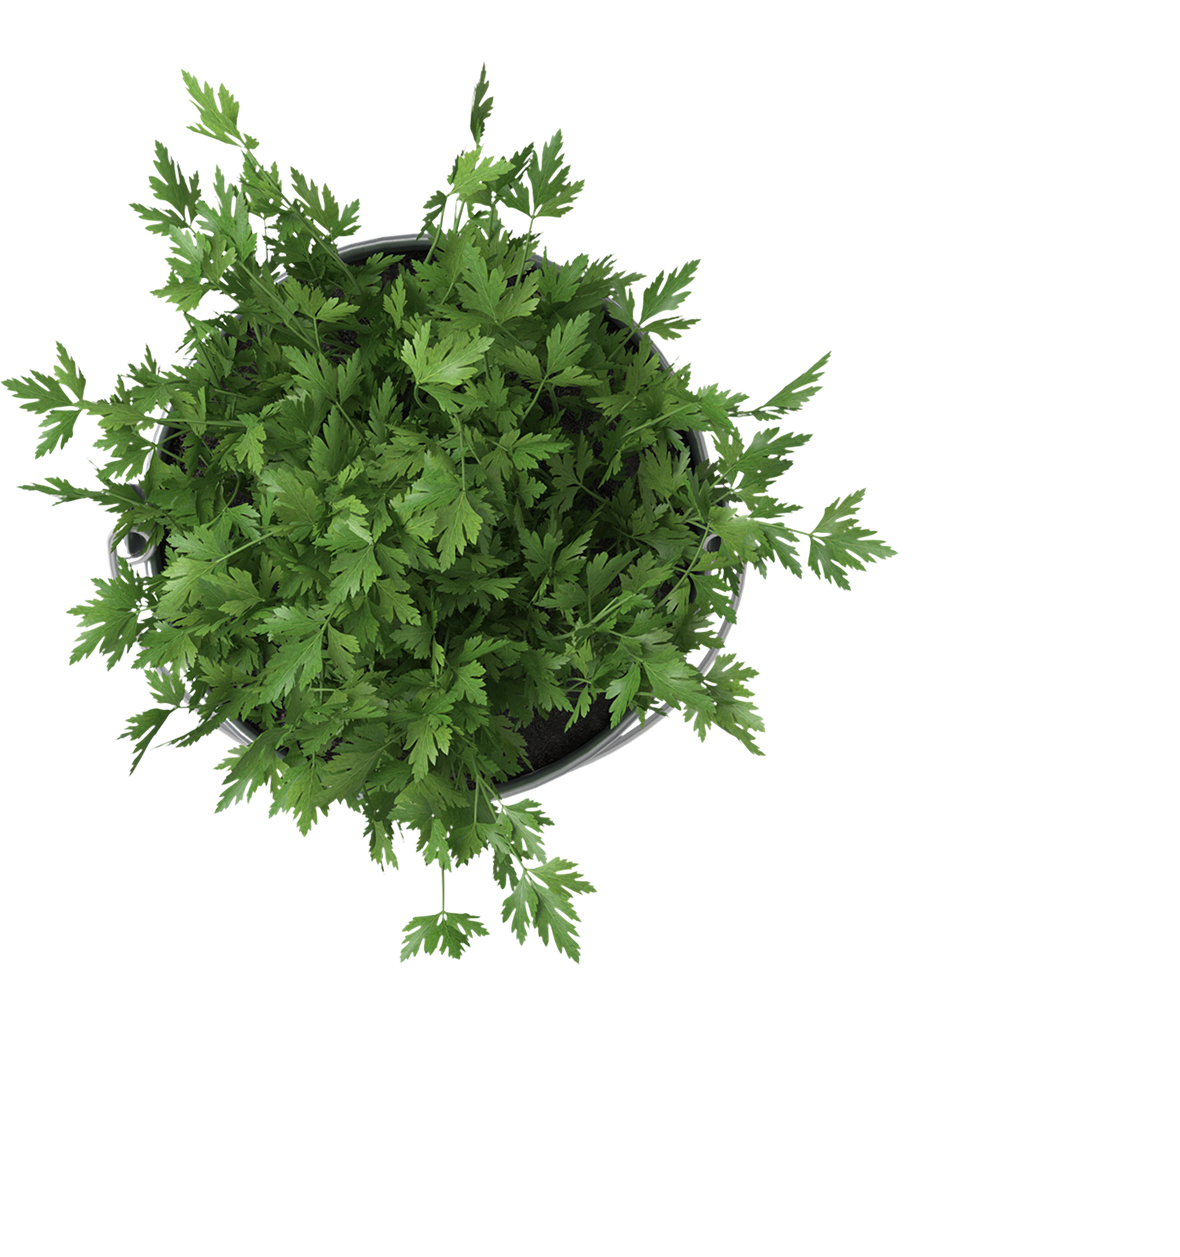 parsleyfromtop